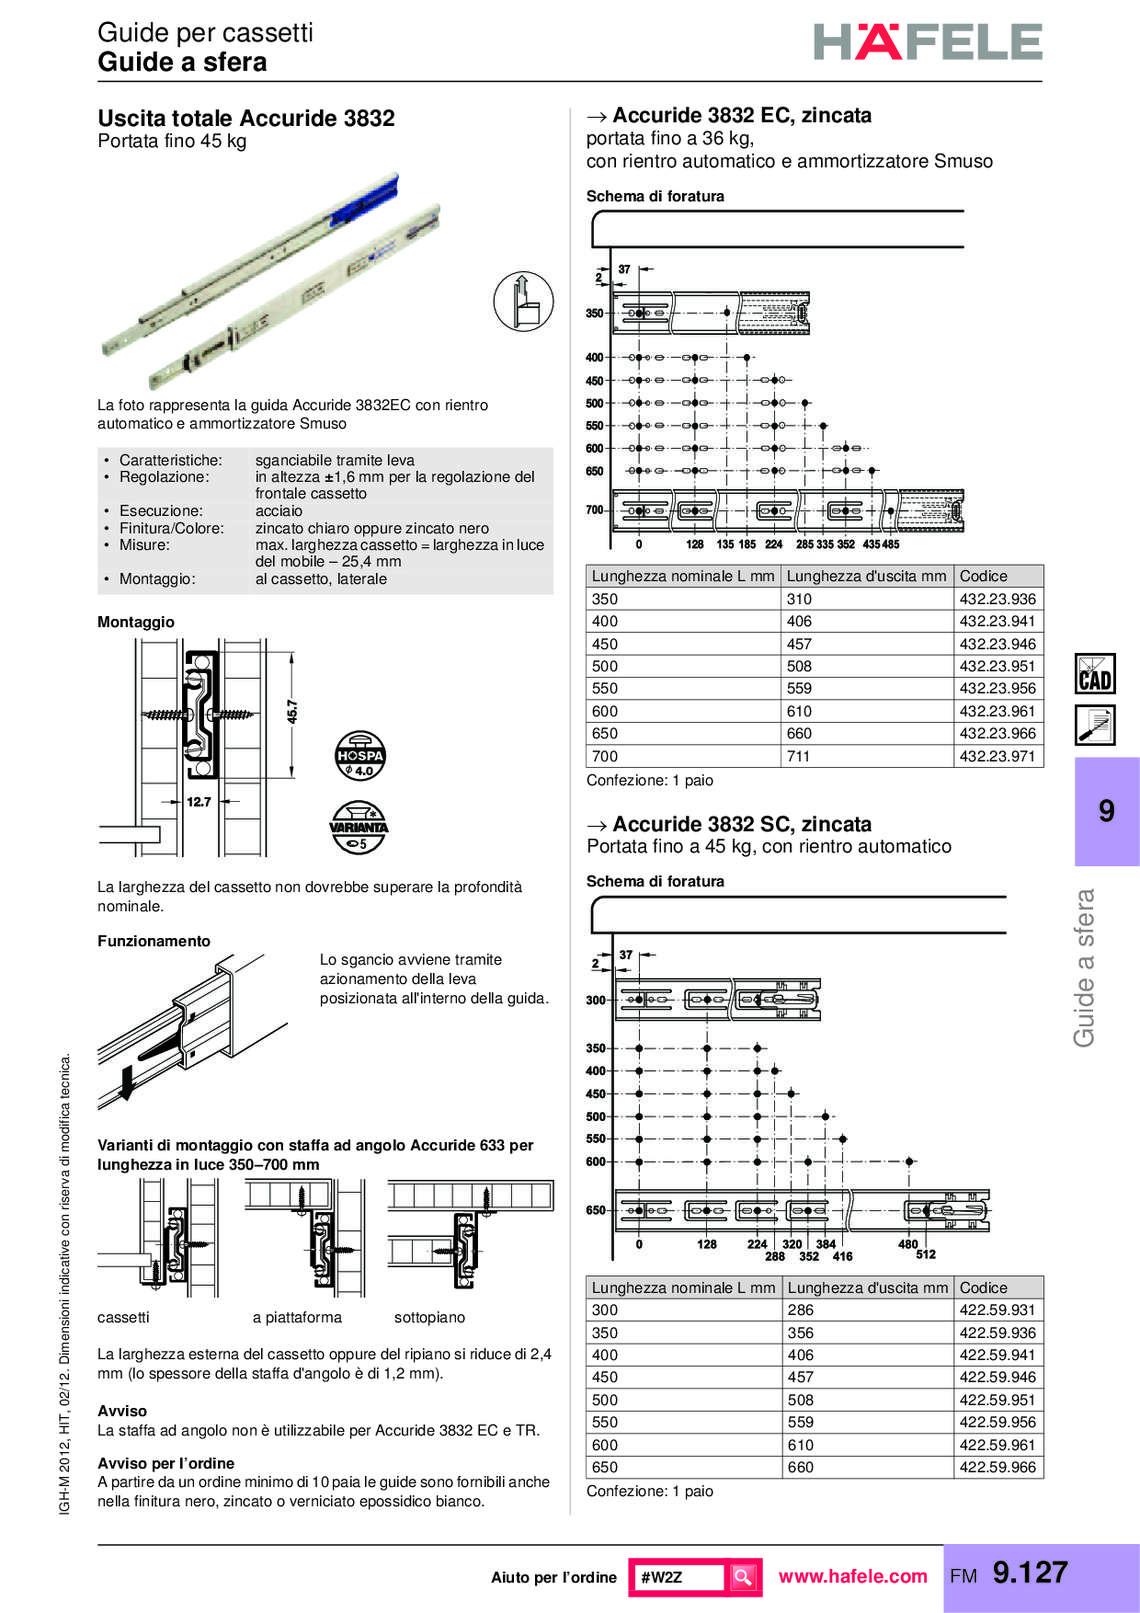 hafele-spondine-e-guide-per-mobili_40_180.jpg